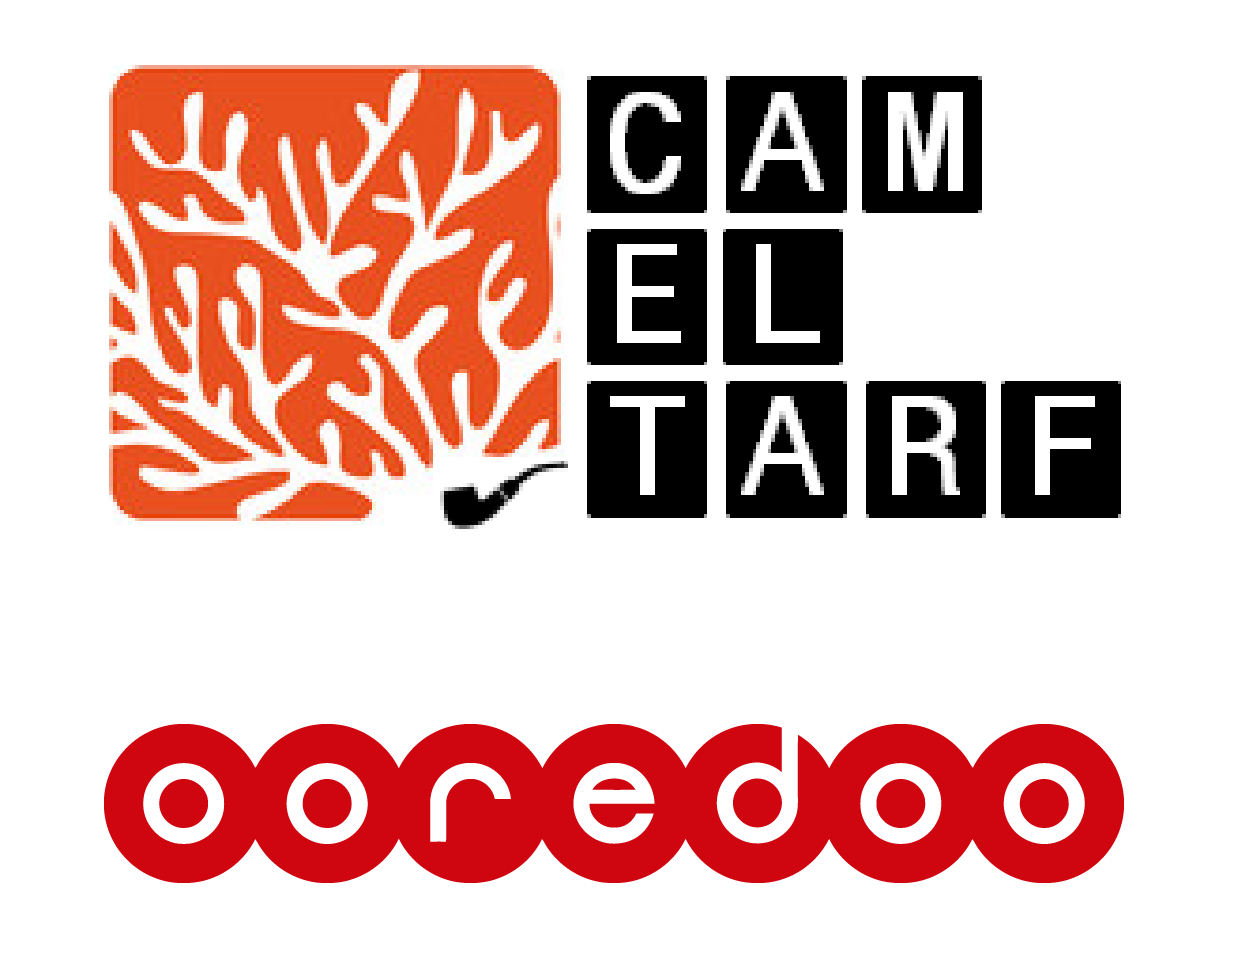 CAM ELTARF - OOREDOO